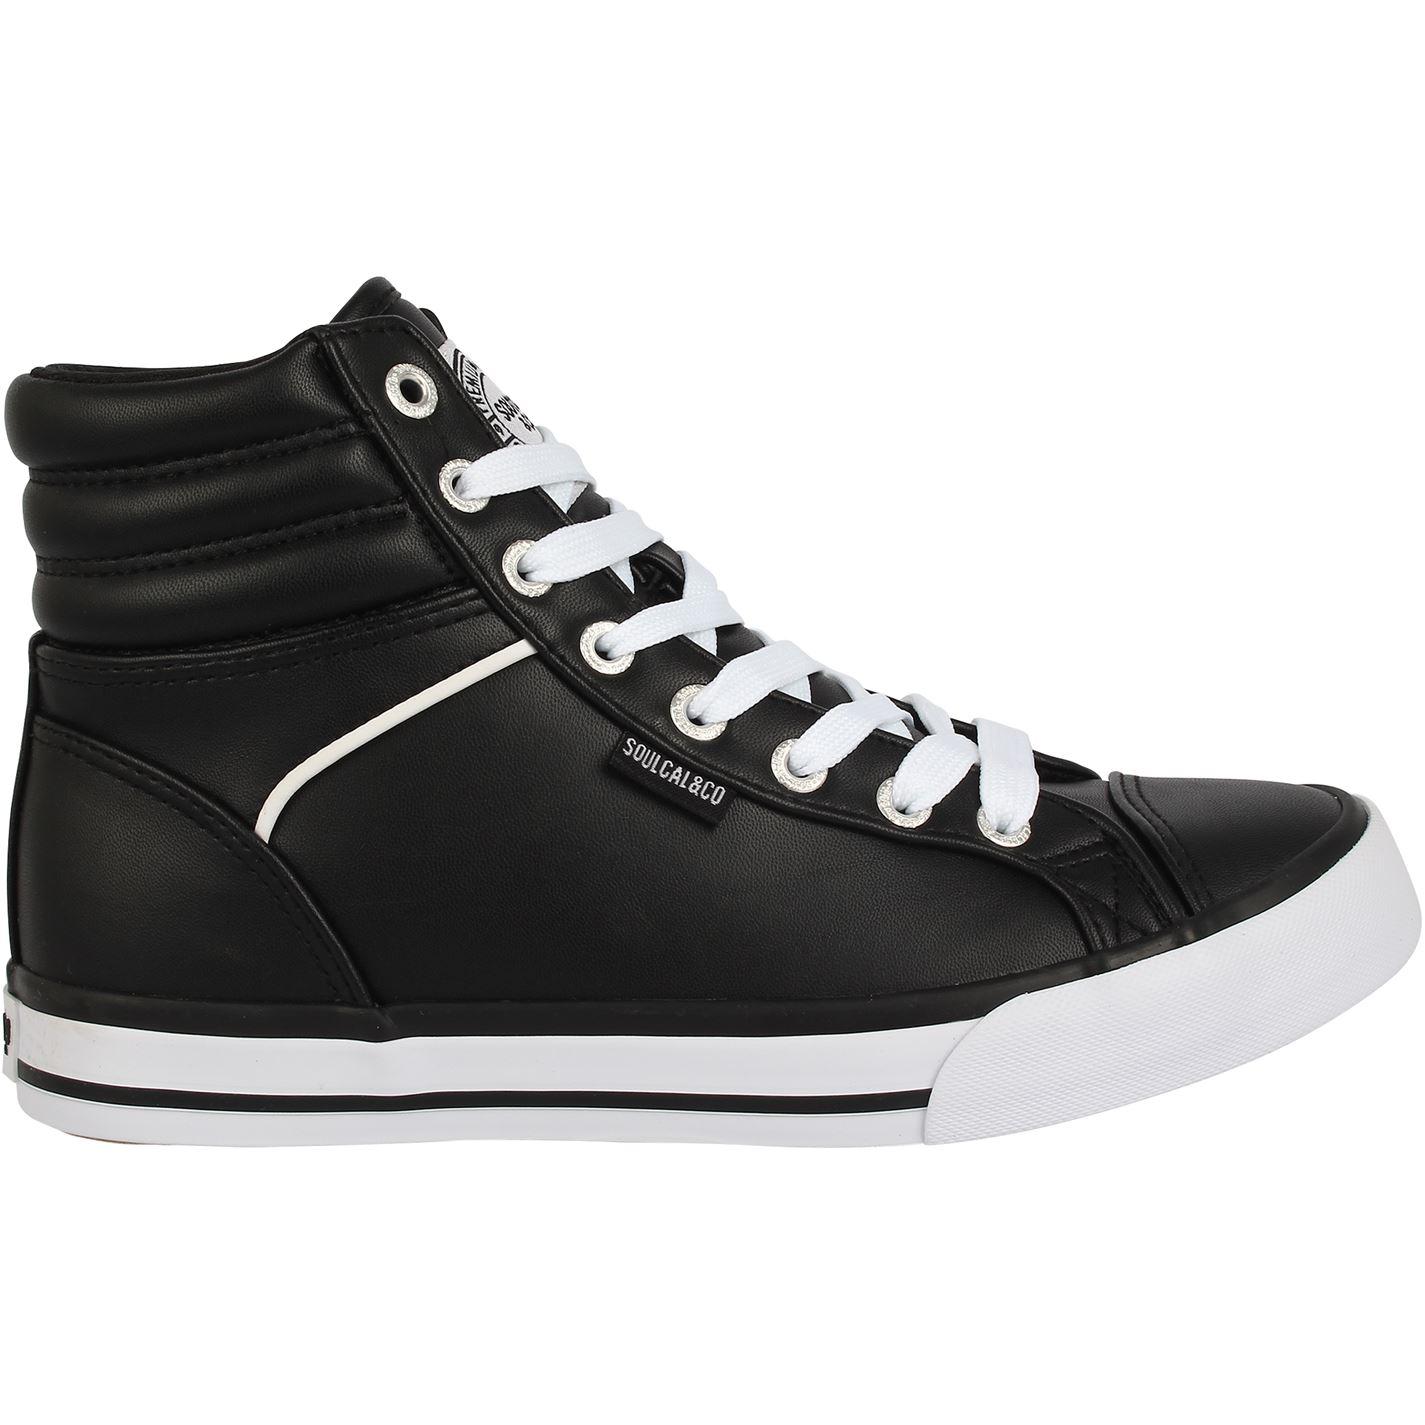 Adidasi inalti SoulCal Asti Juniors negru alb